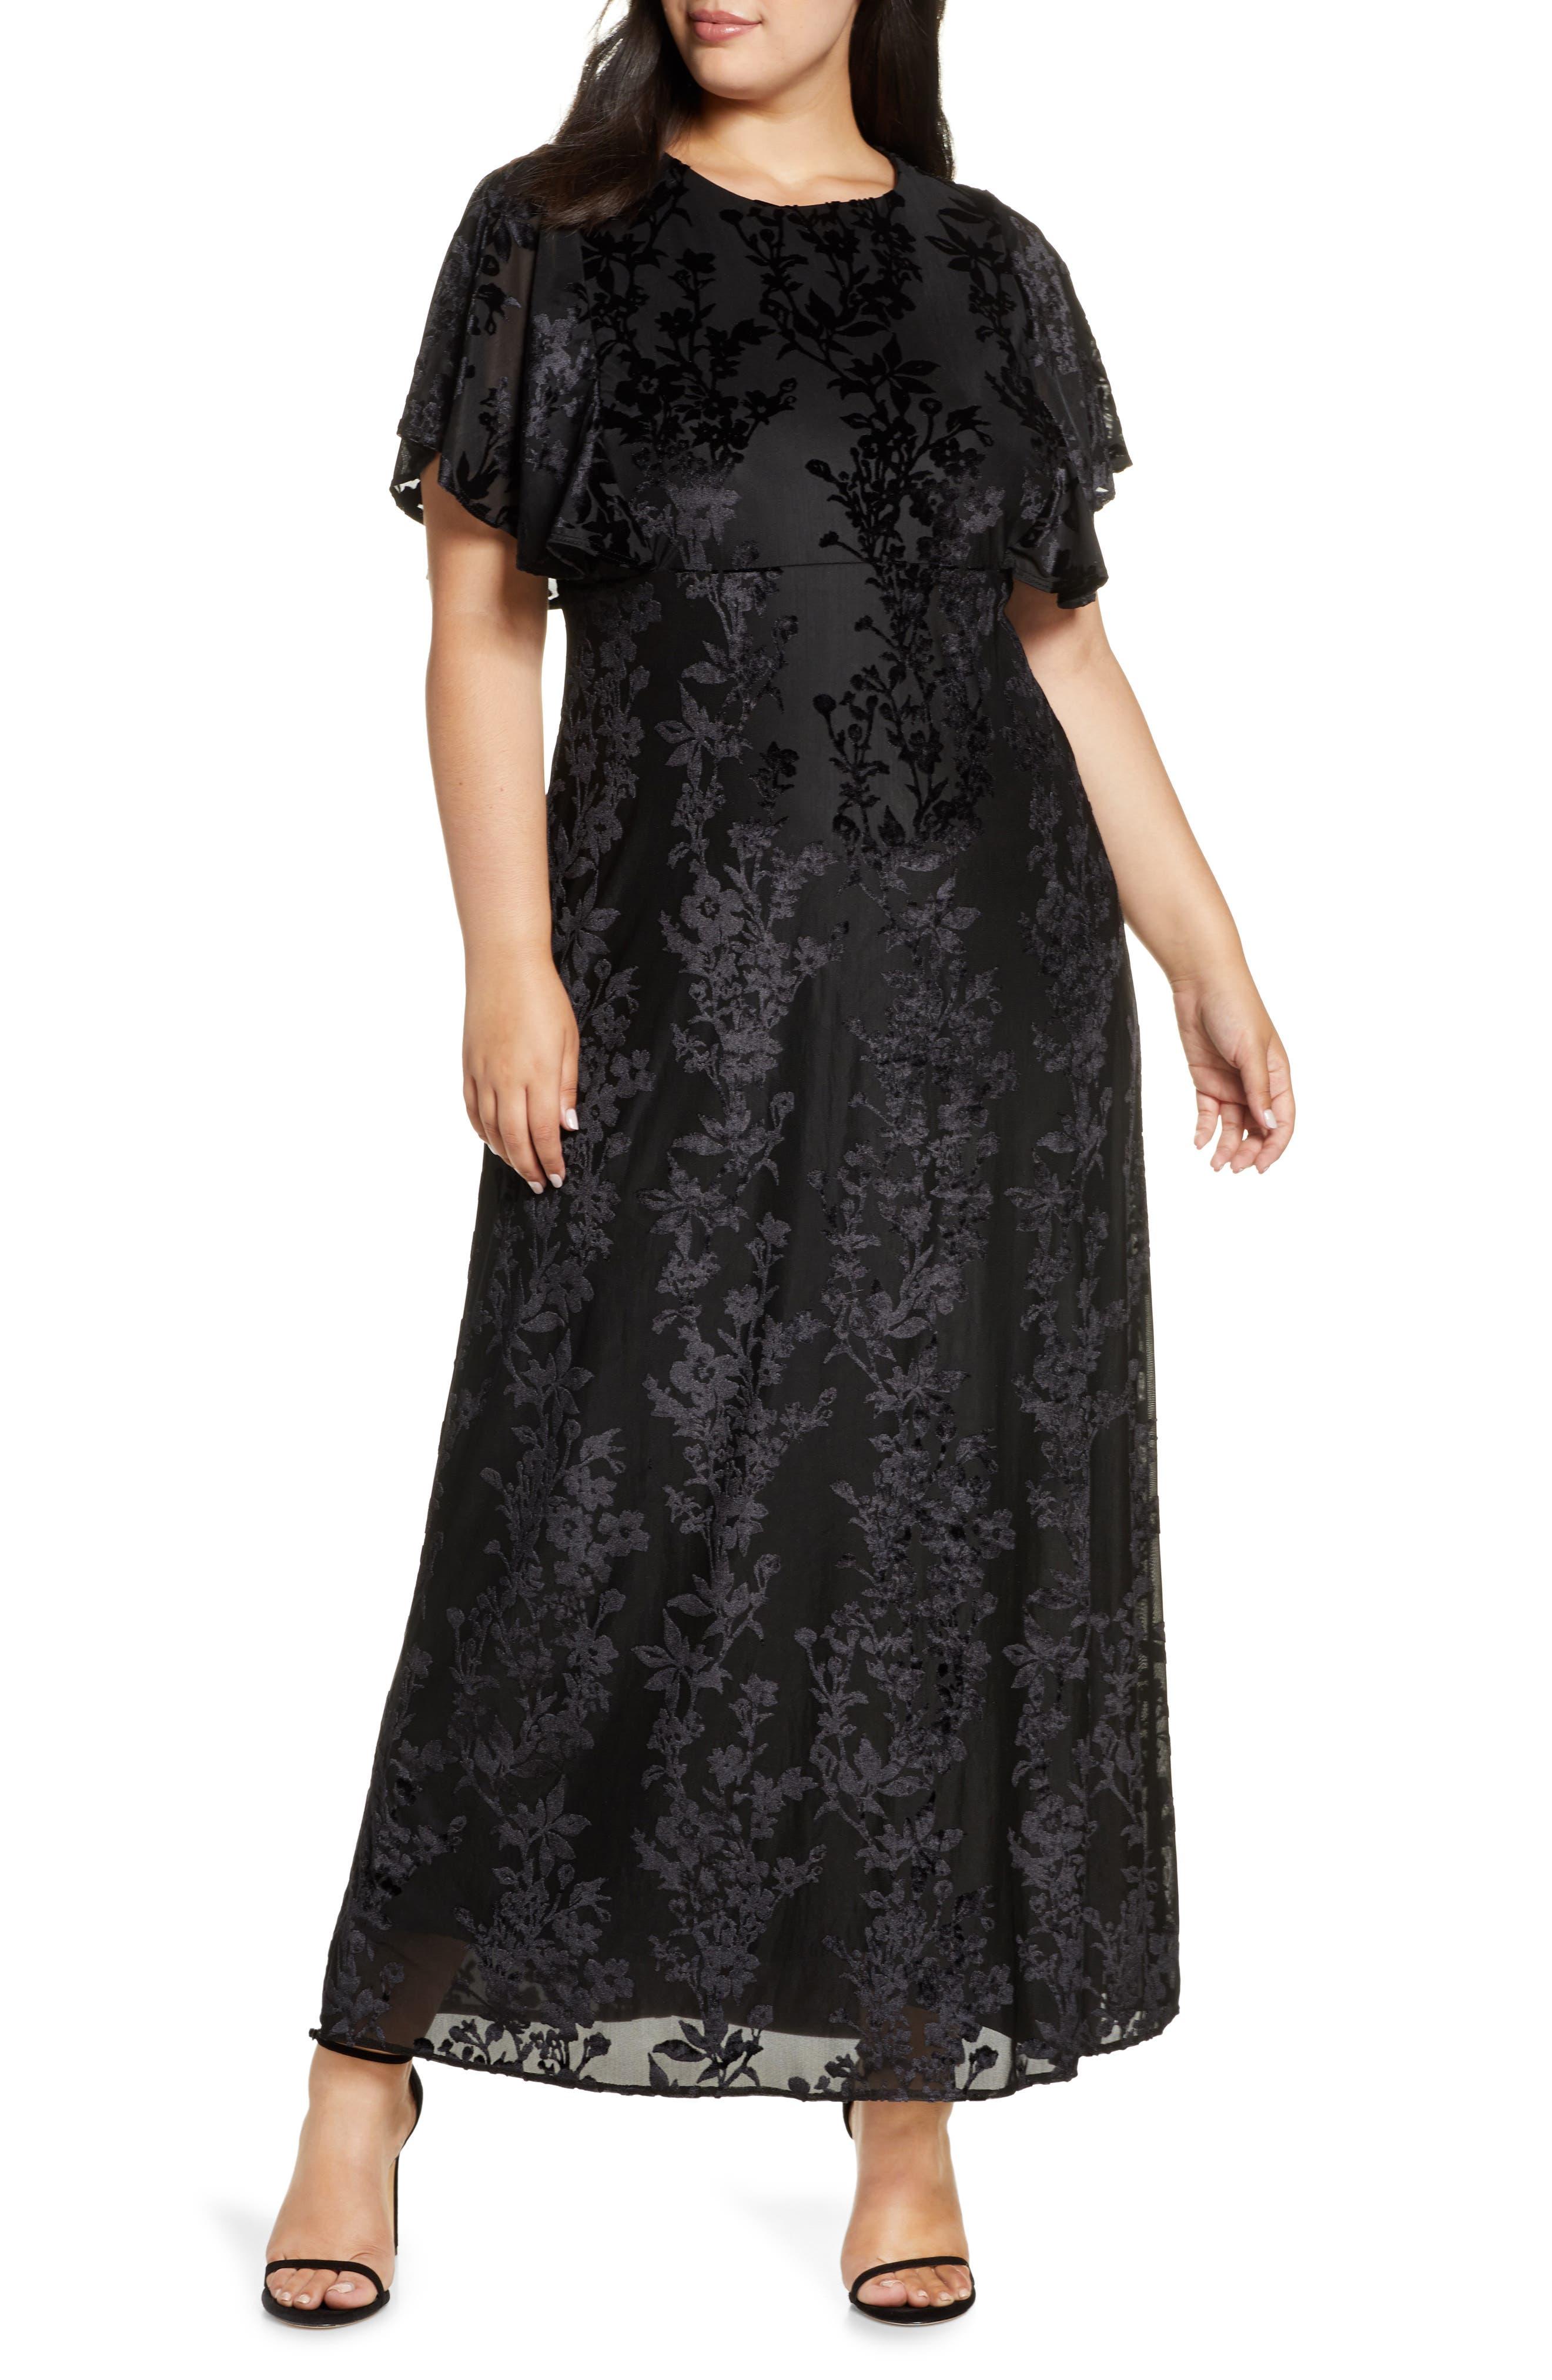 Easy DIY Edwardian Titanic Costumes 1910-1915 Plus Size Womens Kiyonna Parisian Dream Maxi Dress Size 3X - Black $228.00 AT vintagedancer.com